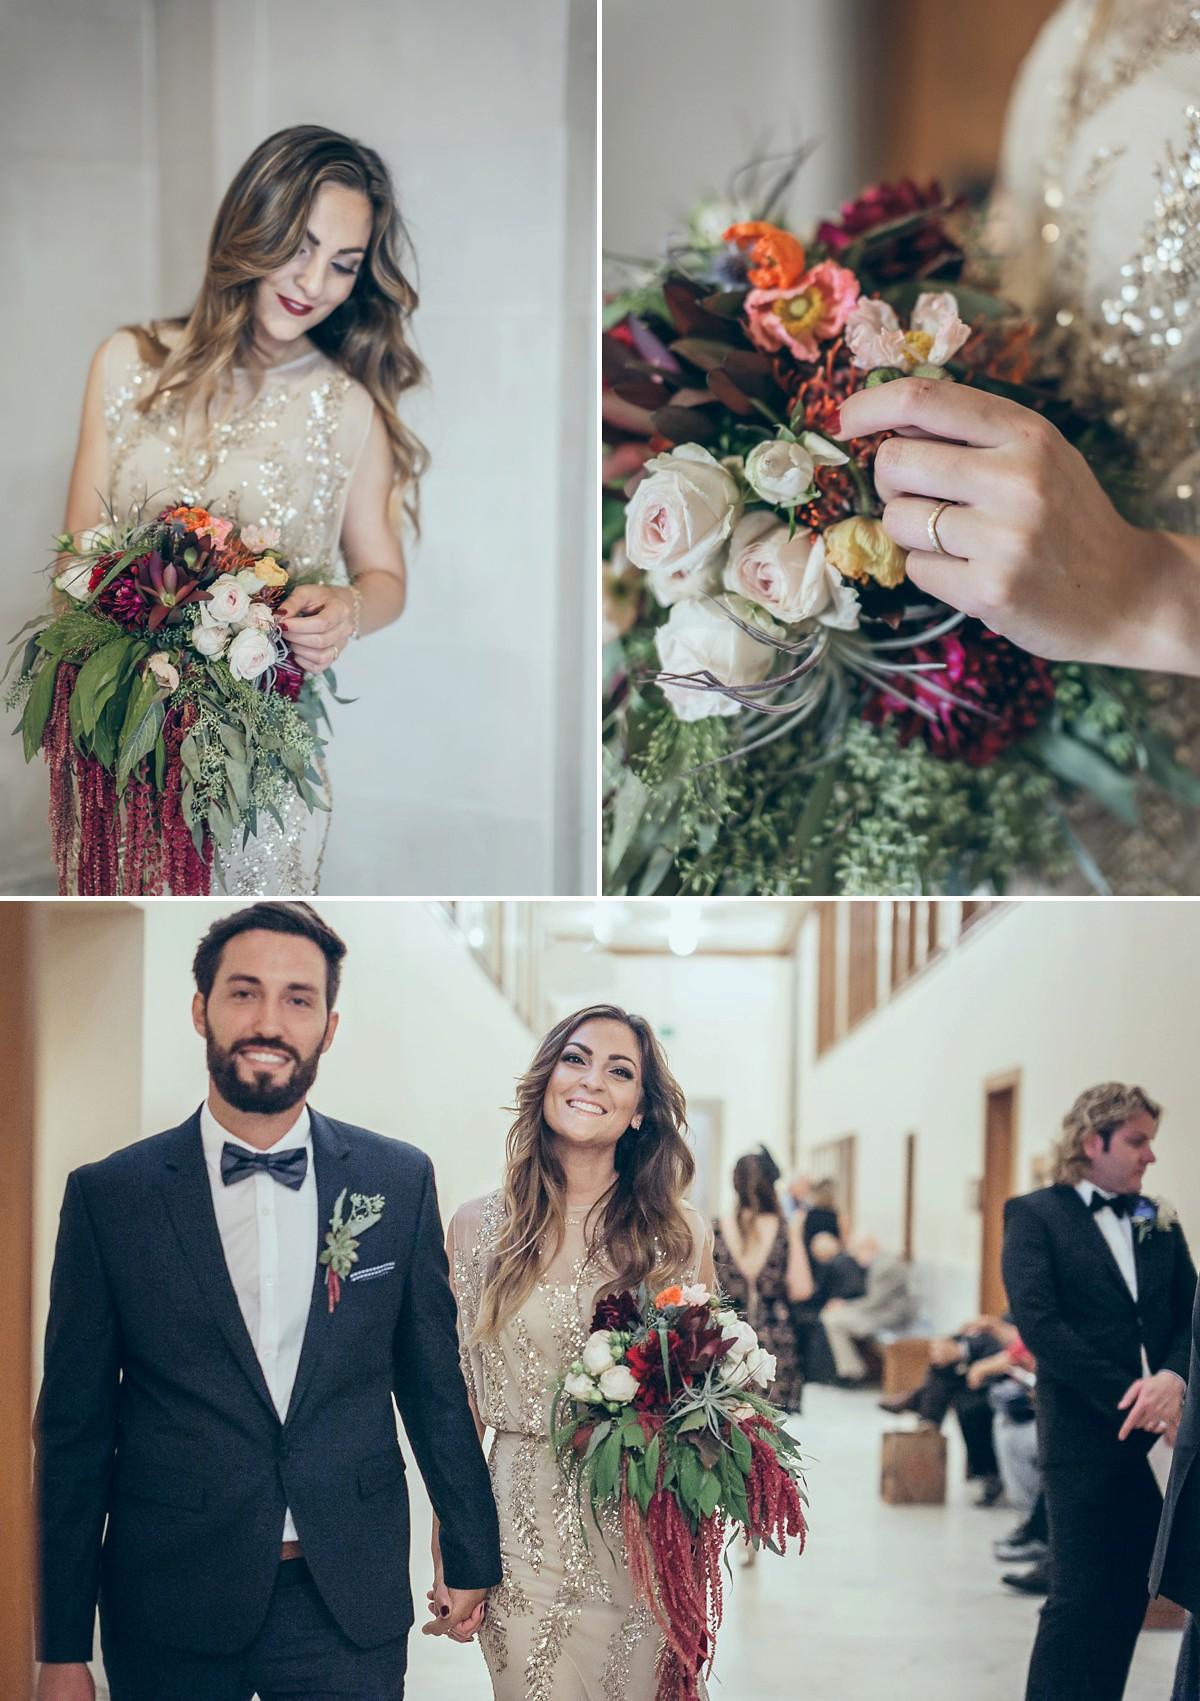 SF-City-hall-wedding-photographer_0001.jpg